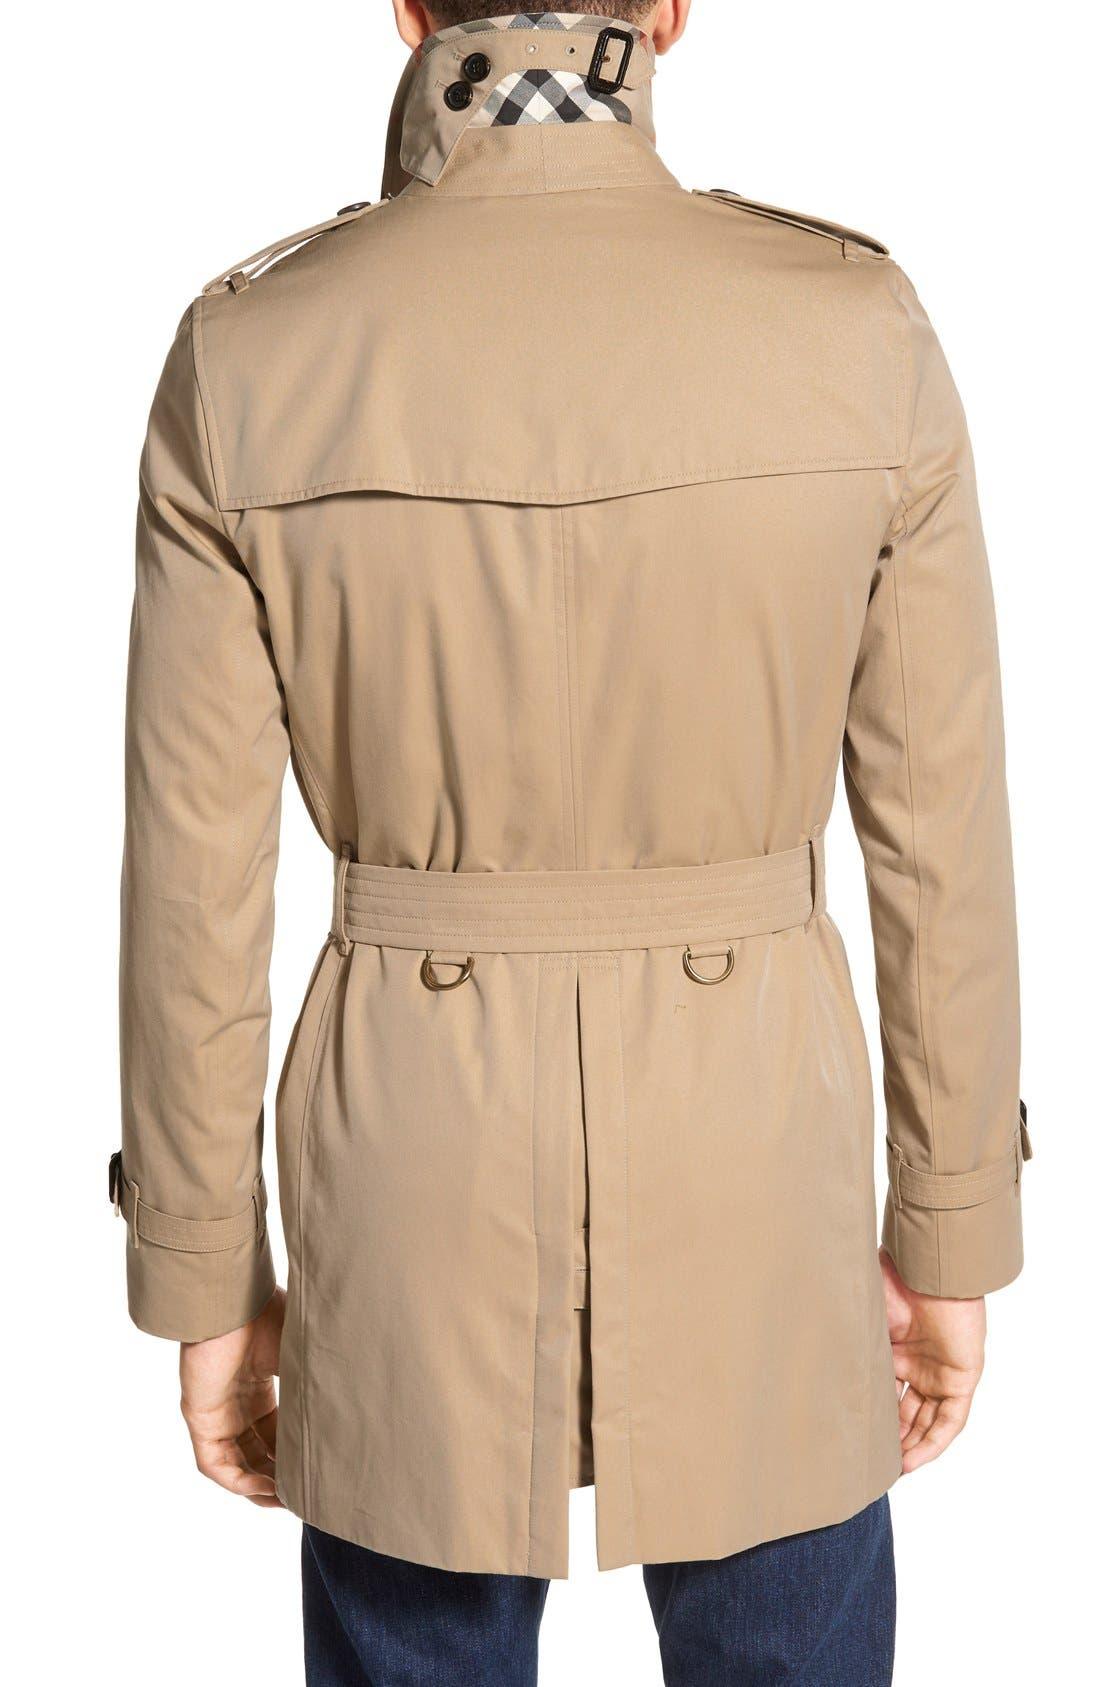 Kensington Double Breasted Trench Coat,                             Alternate thumbnail 3, color,                             HONEY